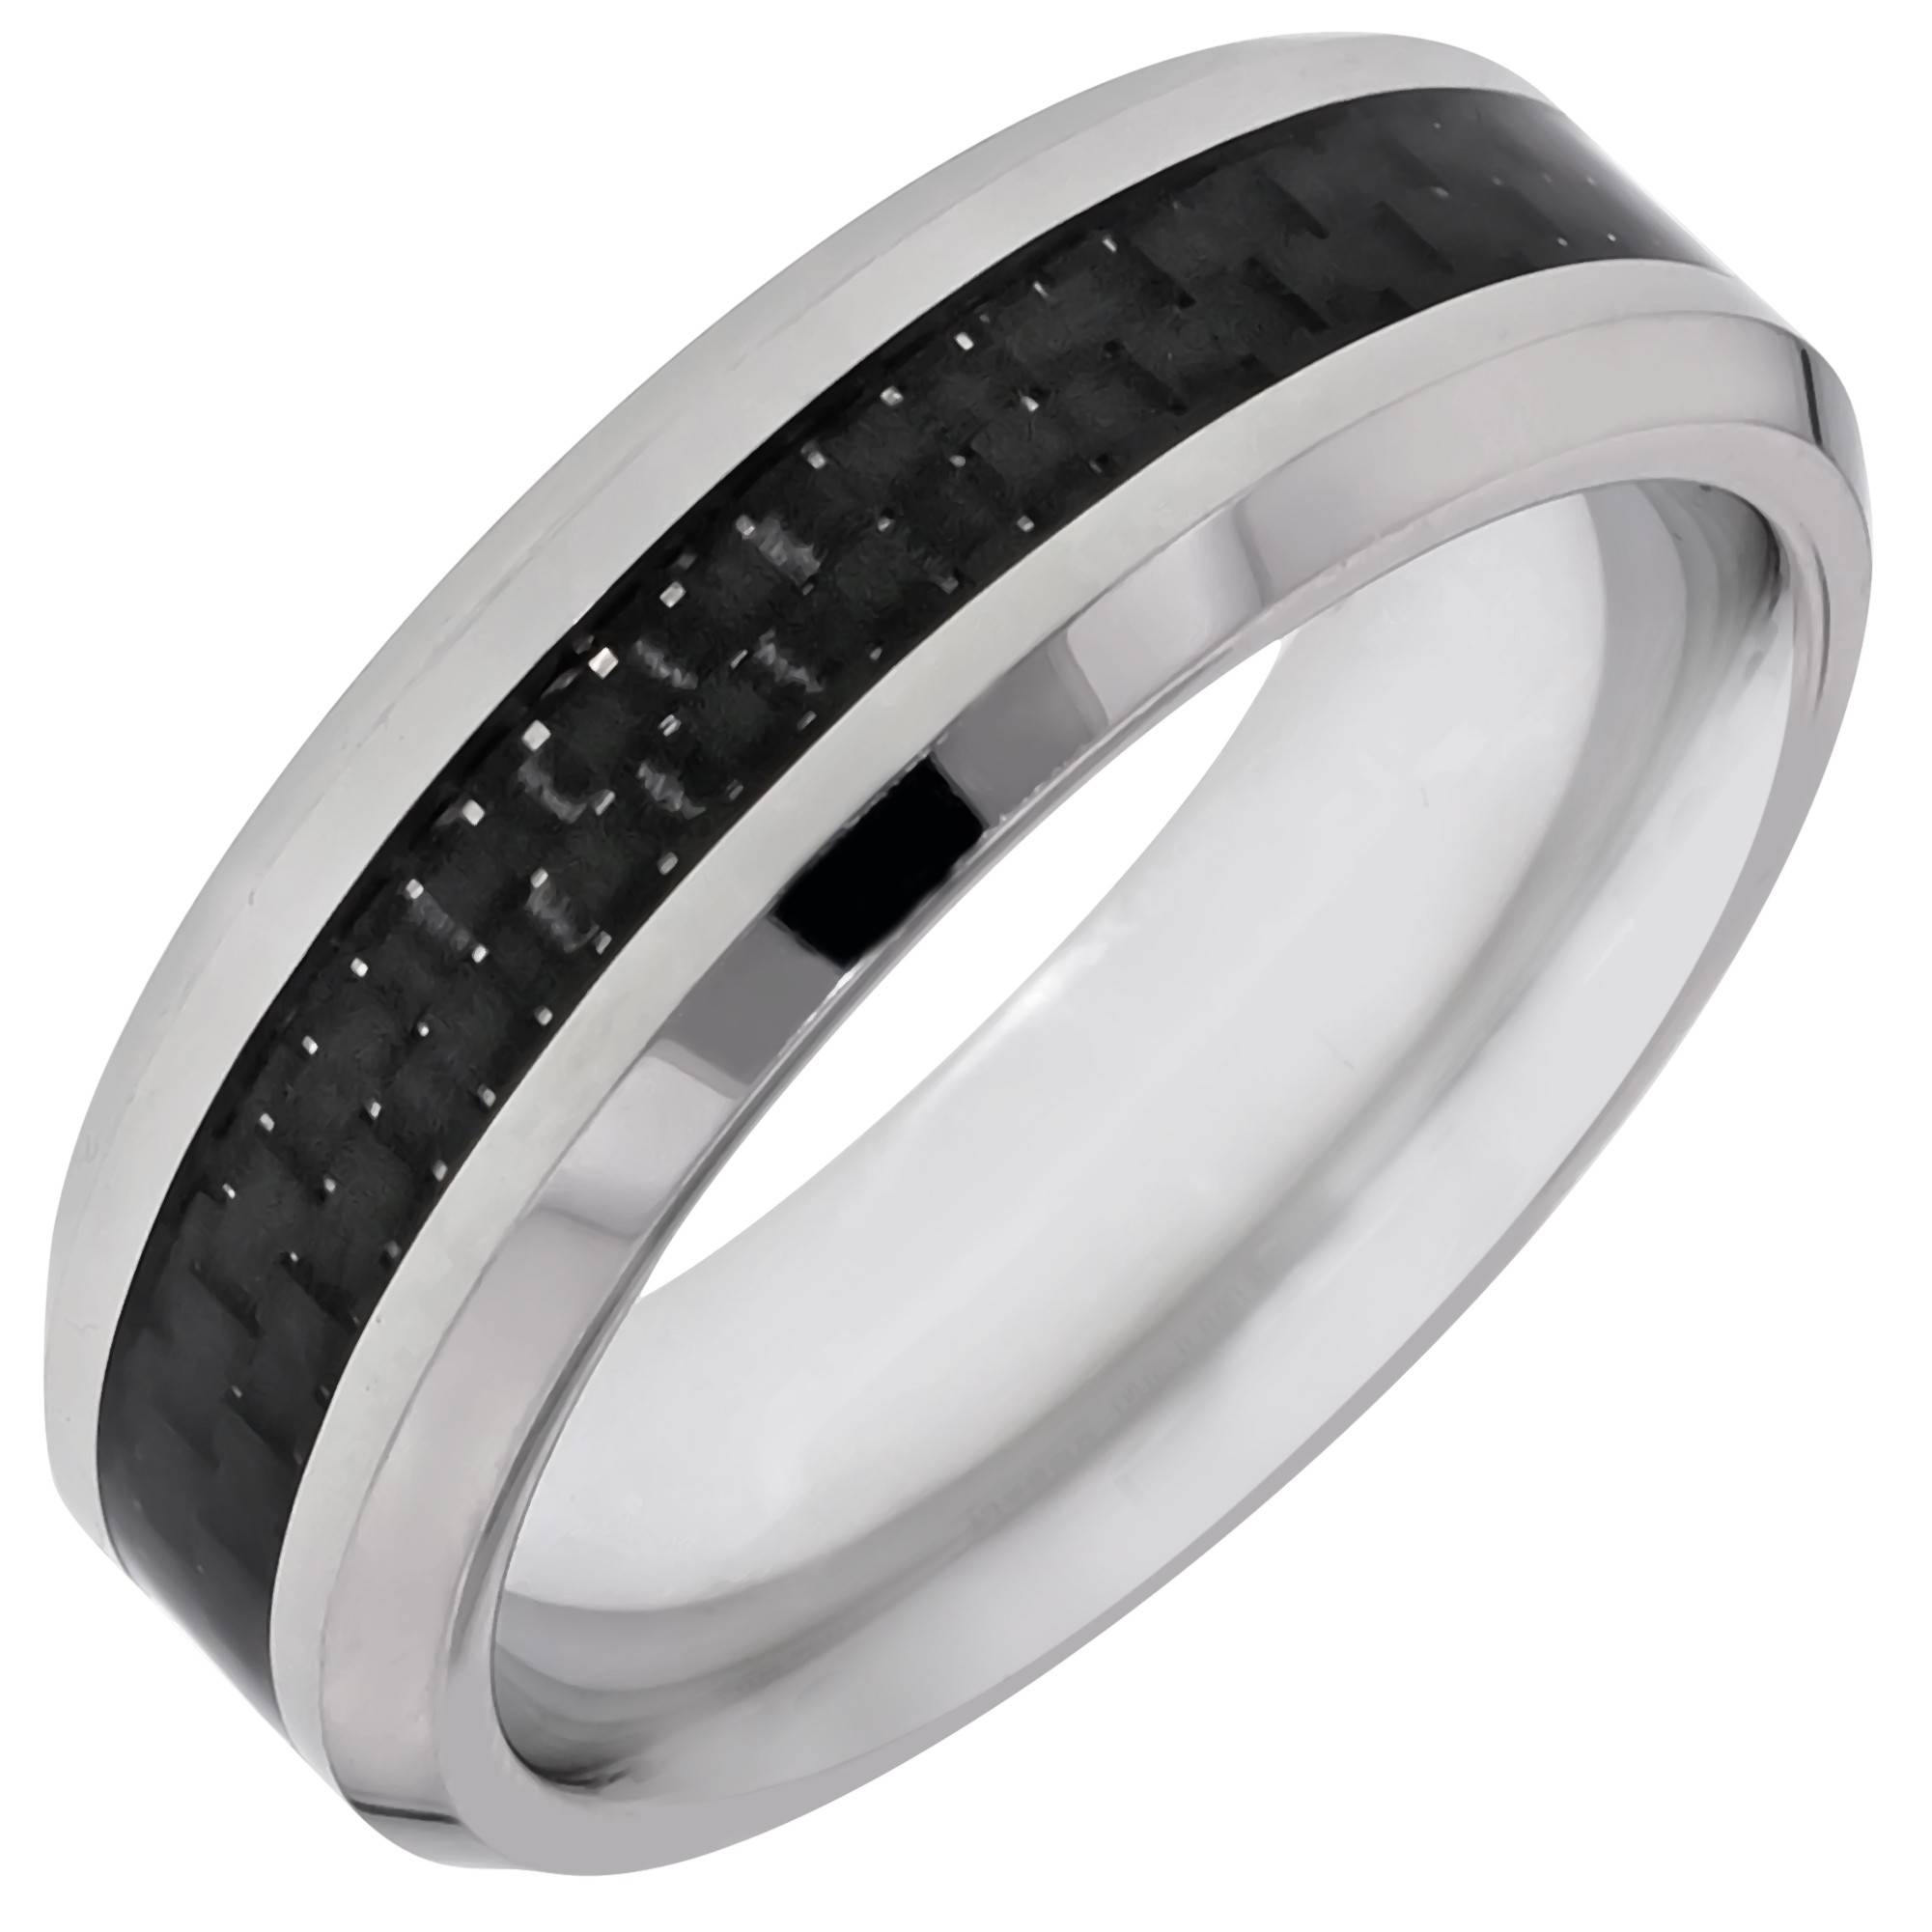 Mens Cobalt Chrome And Carbon Fiber Comfort Fit Wedding Band (7Mm) Inside Cobalt Mens Wedding Rings (View 13 of 15)